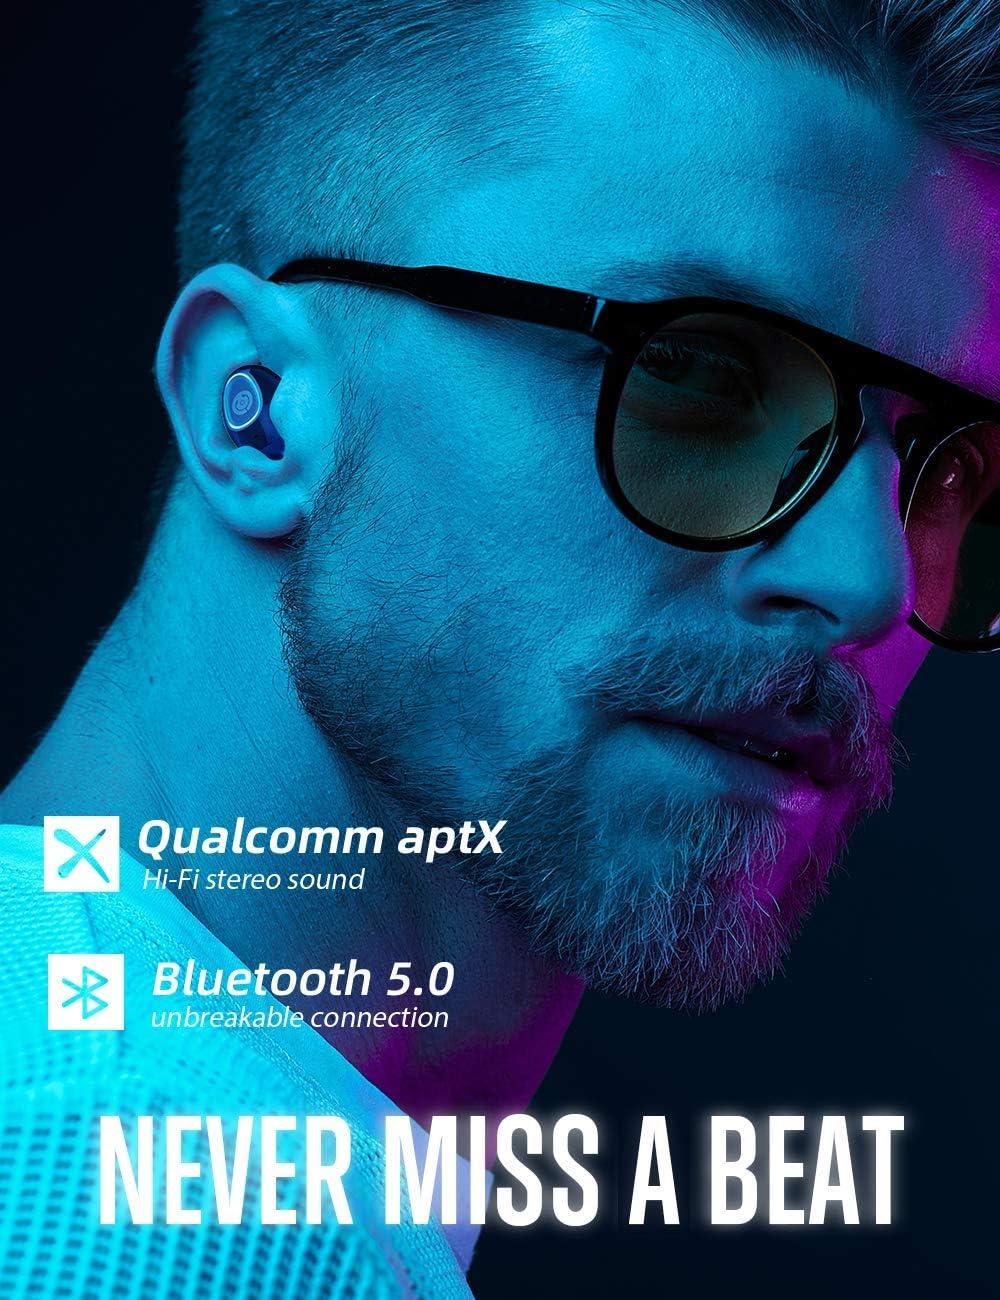 Cystereo Fusion Bluetooth IEM